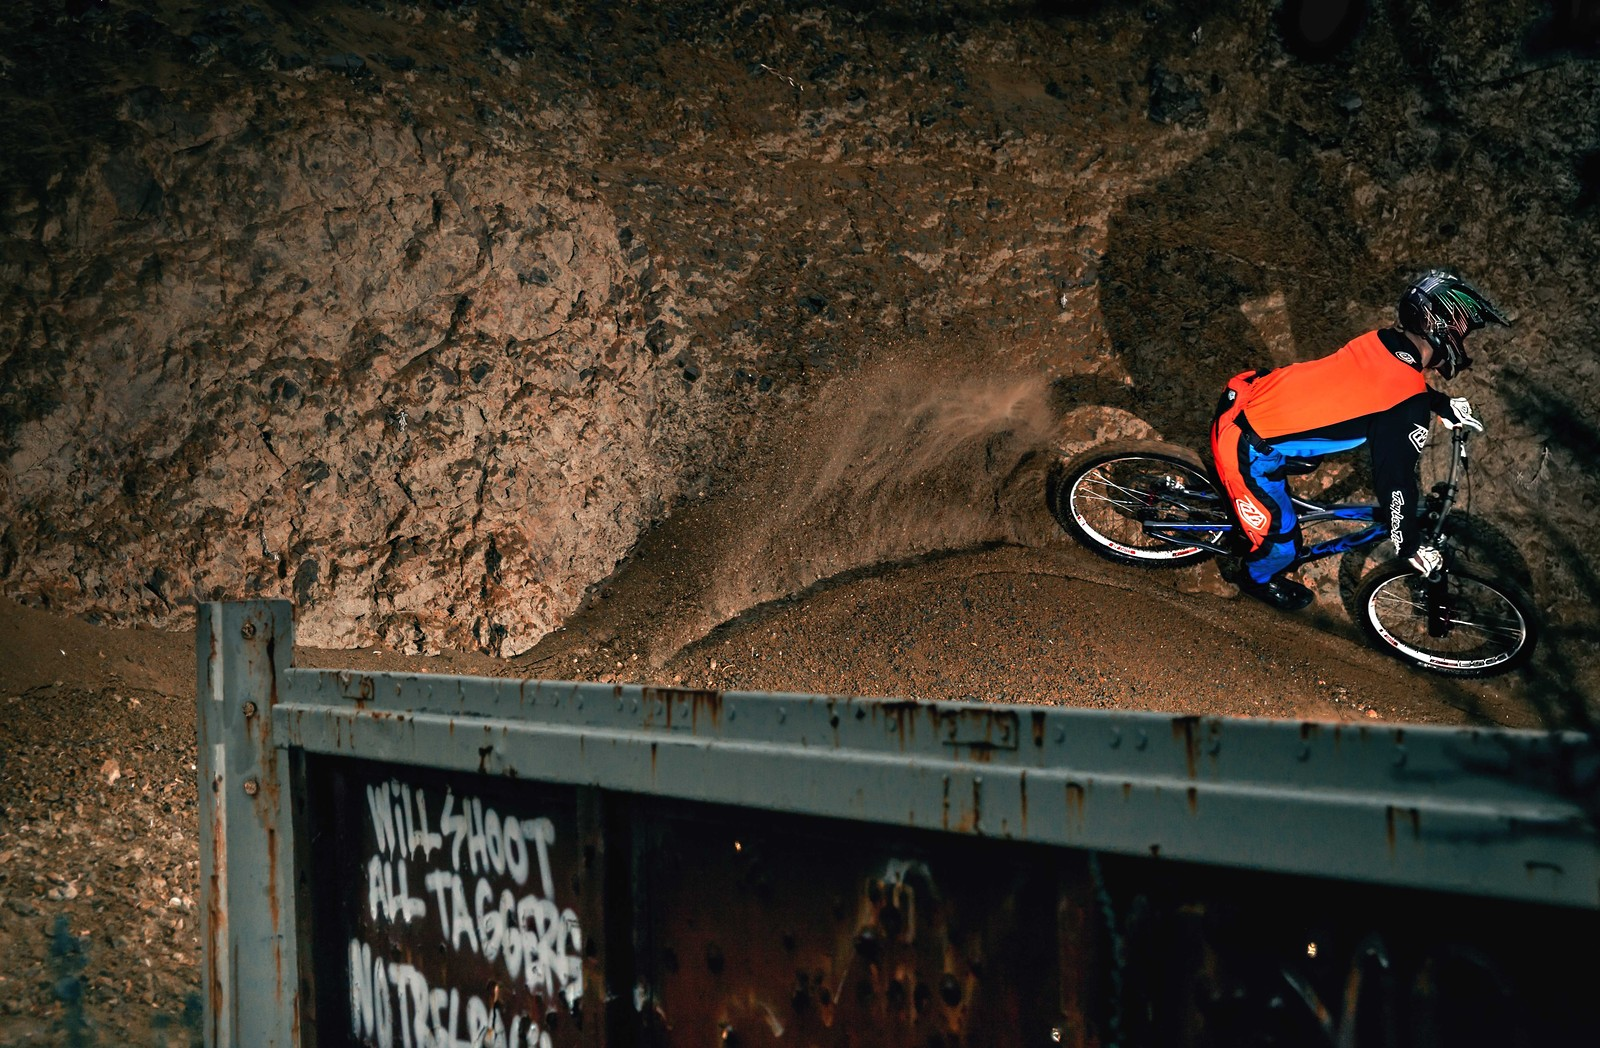 Rainy Day Gloom - GnarHuck - Mountain Biking Pictures - Vital MTB